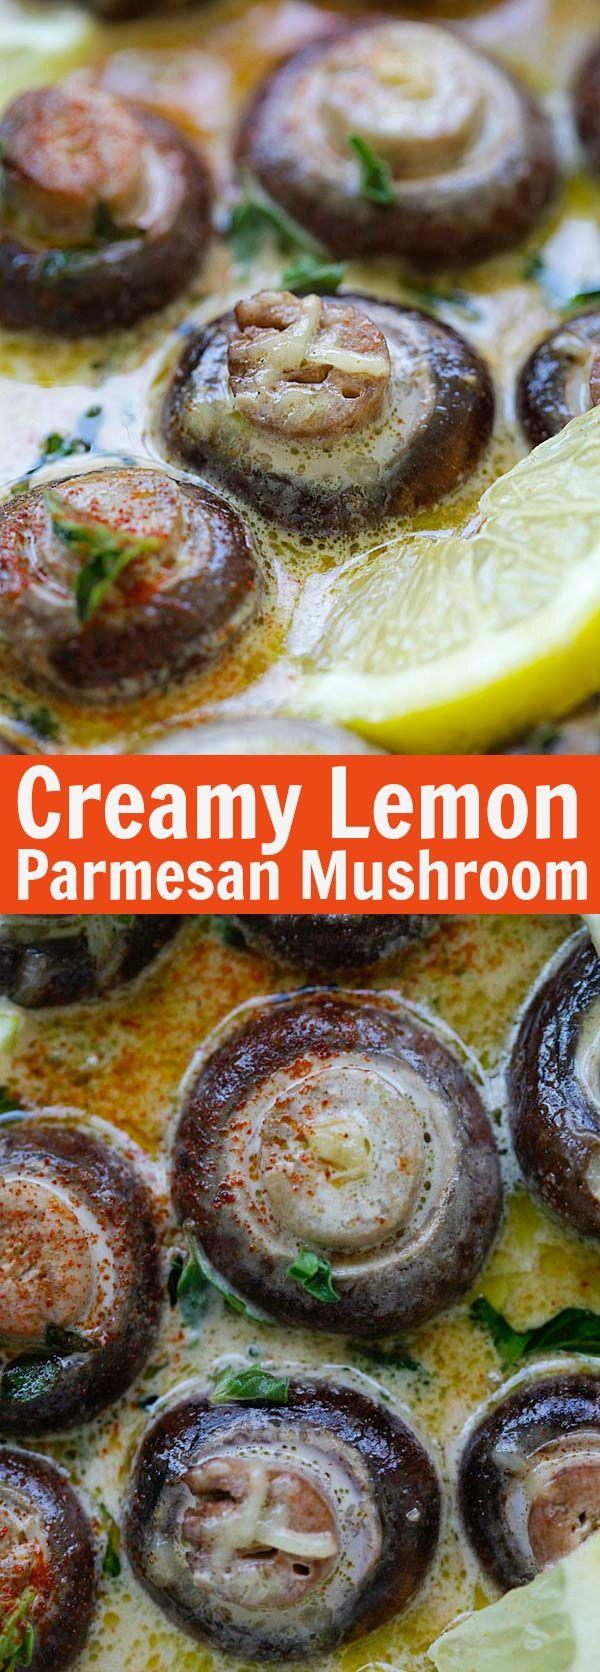 Creamy Lemon Parmesan Mushrooms – BEST mushrooms you'll ever make. Soaked in a creamy, cheesy and lemony Parmesan sauce. Perfect recipe that takes 15 mins | rasamalaysia.com